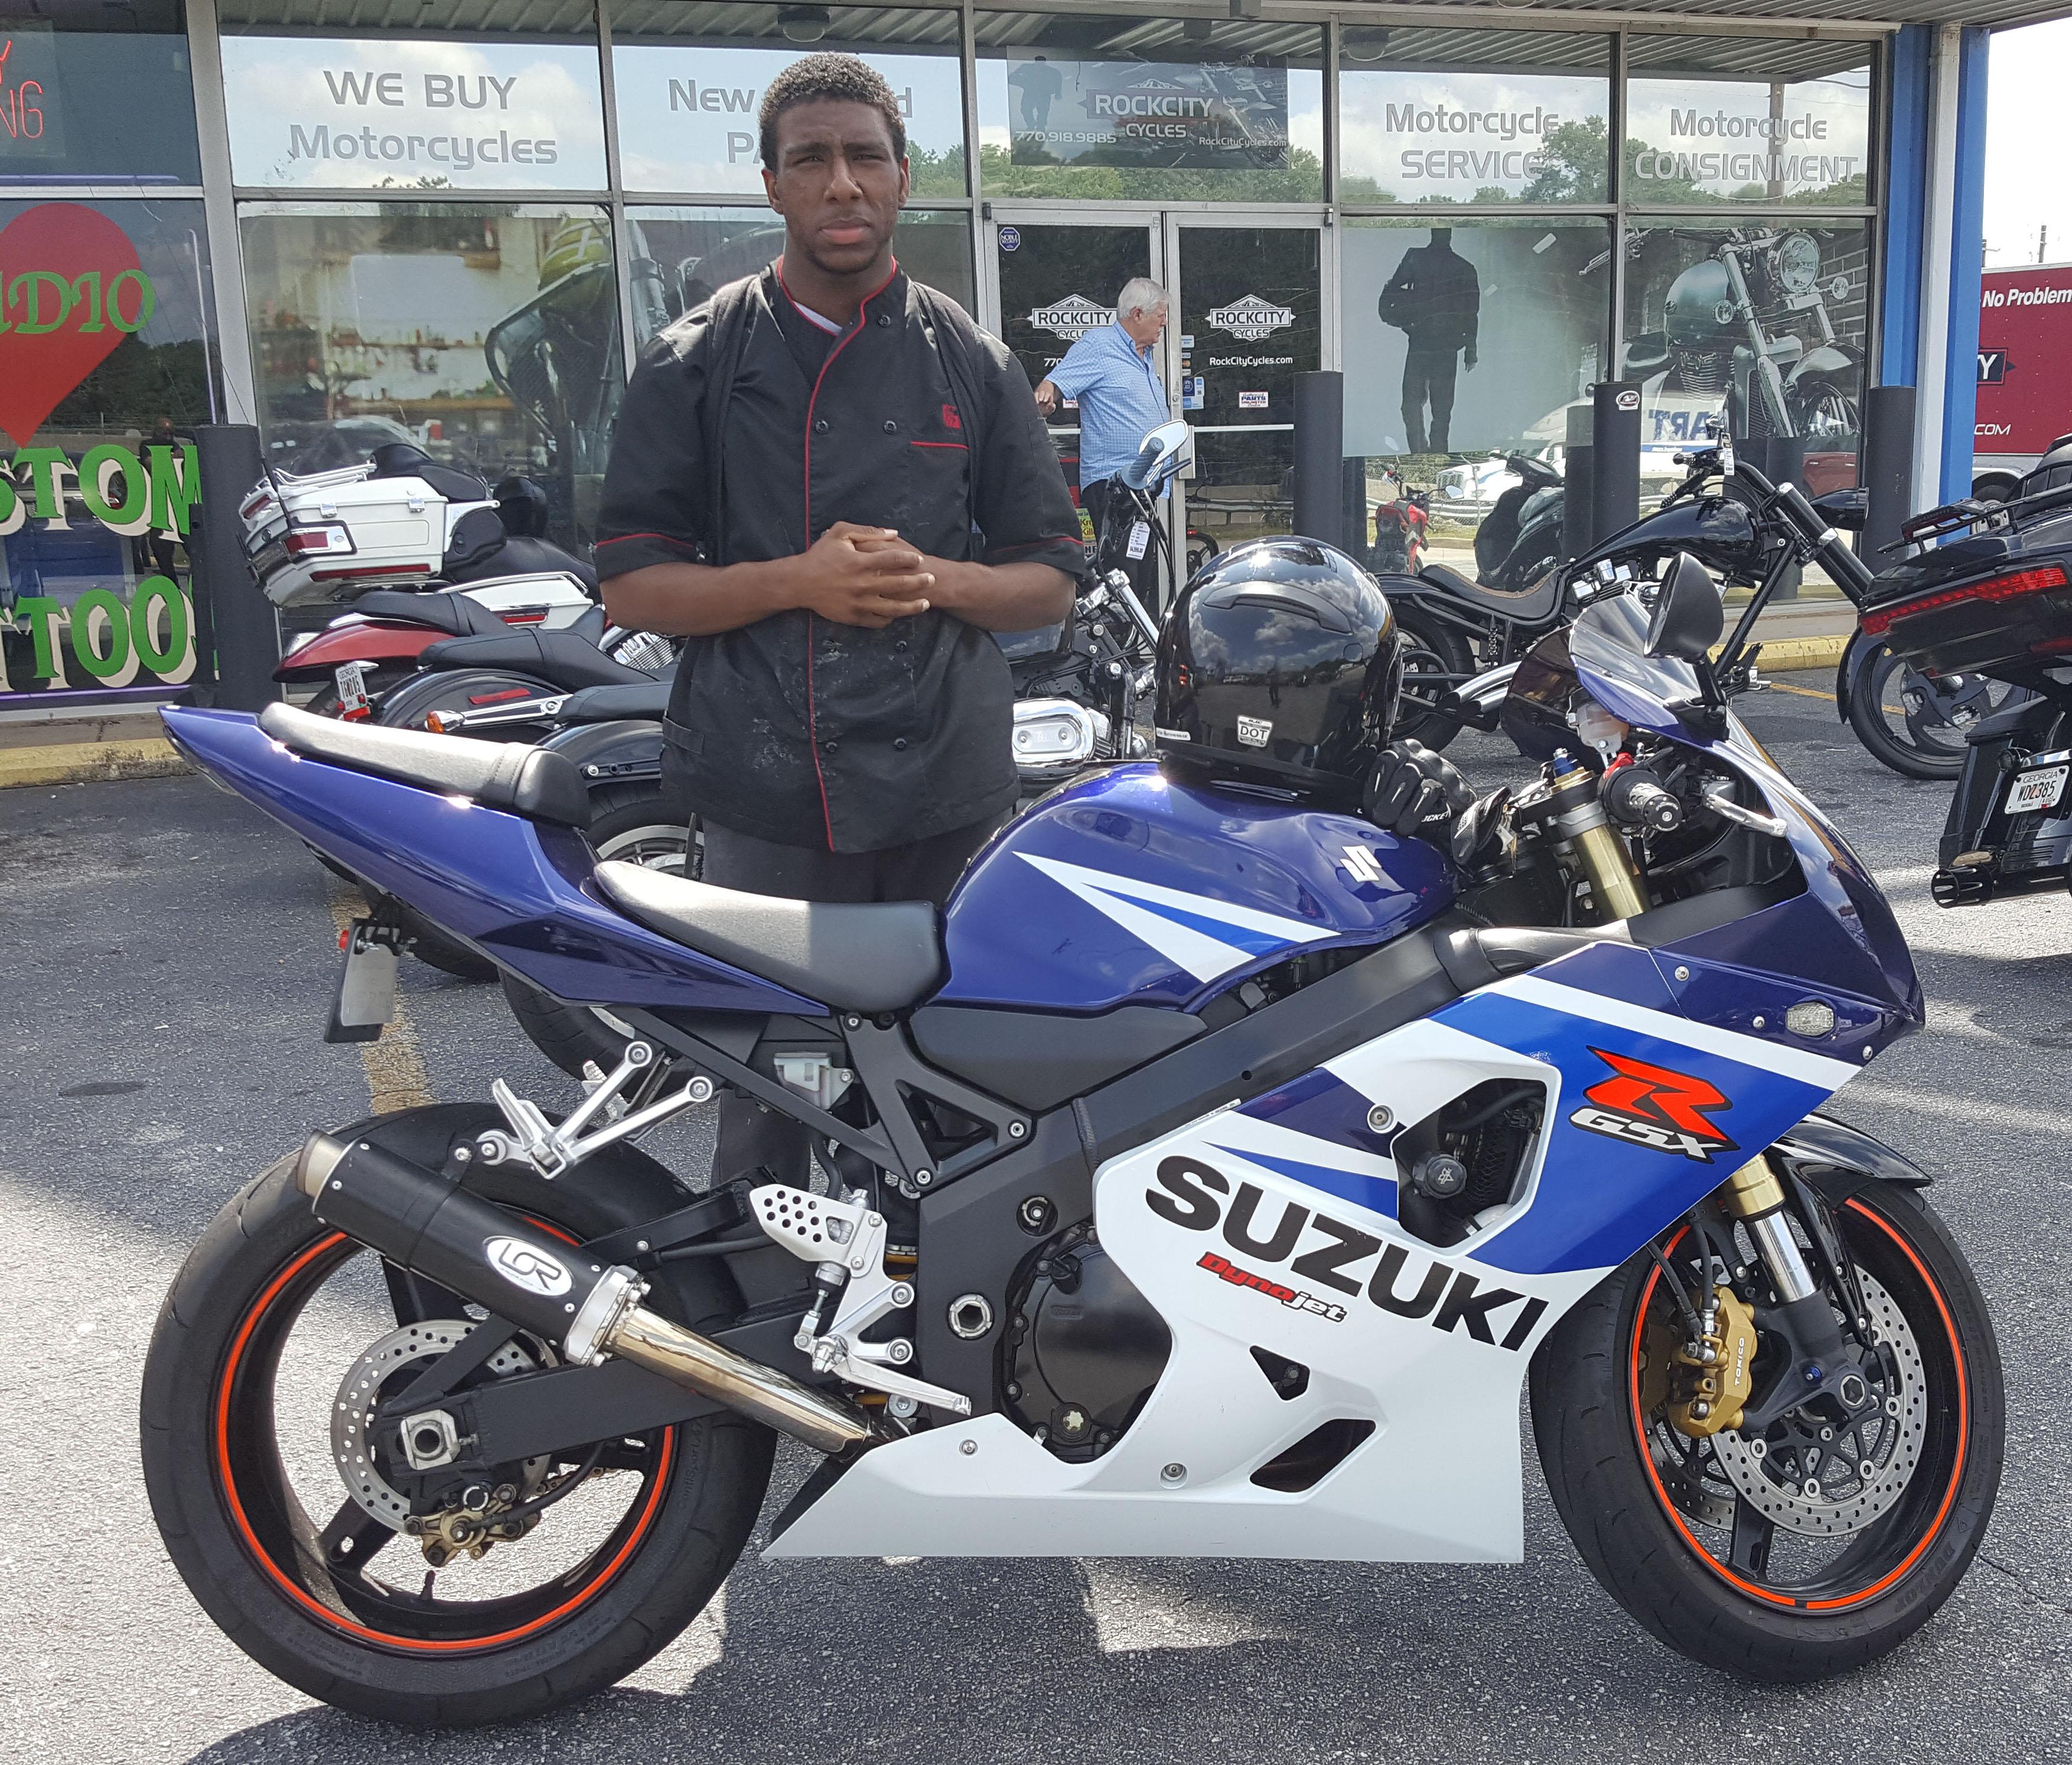 Bakari B. with his 2005 Suzuki GSX-R750